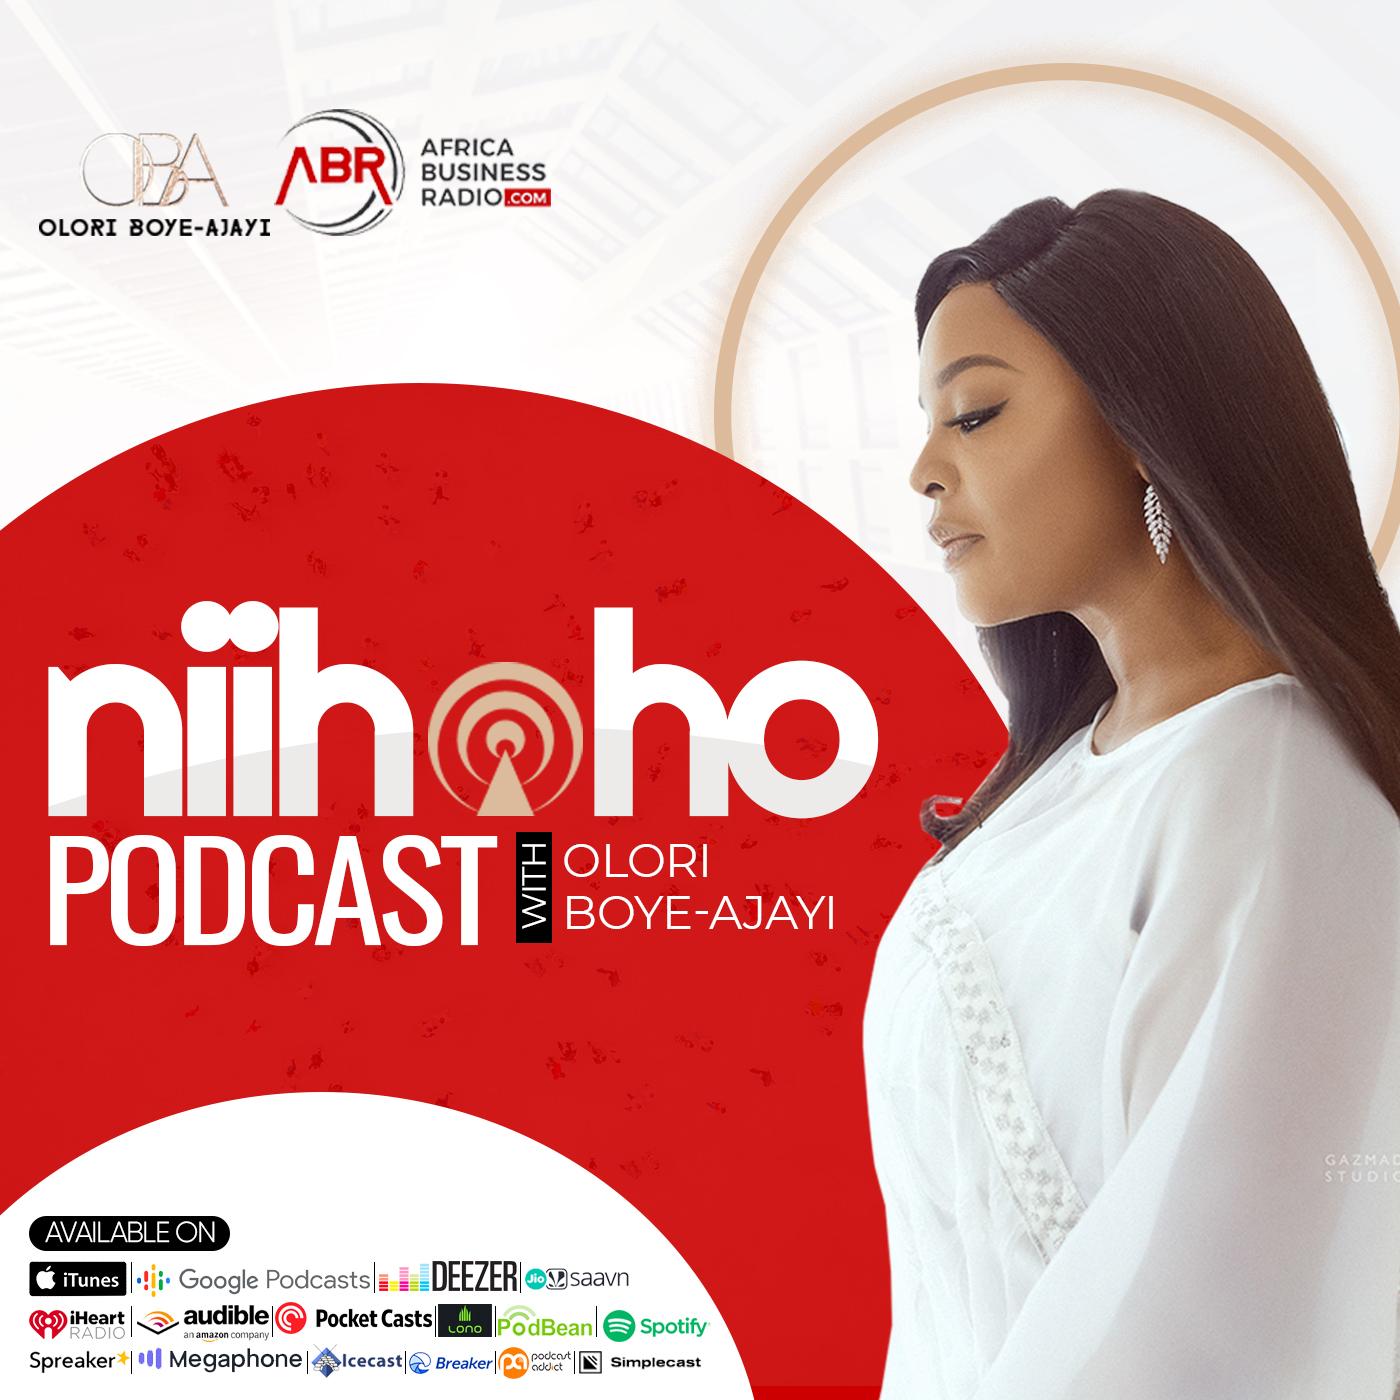 Niihoho The Podcast